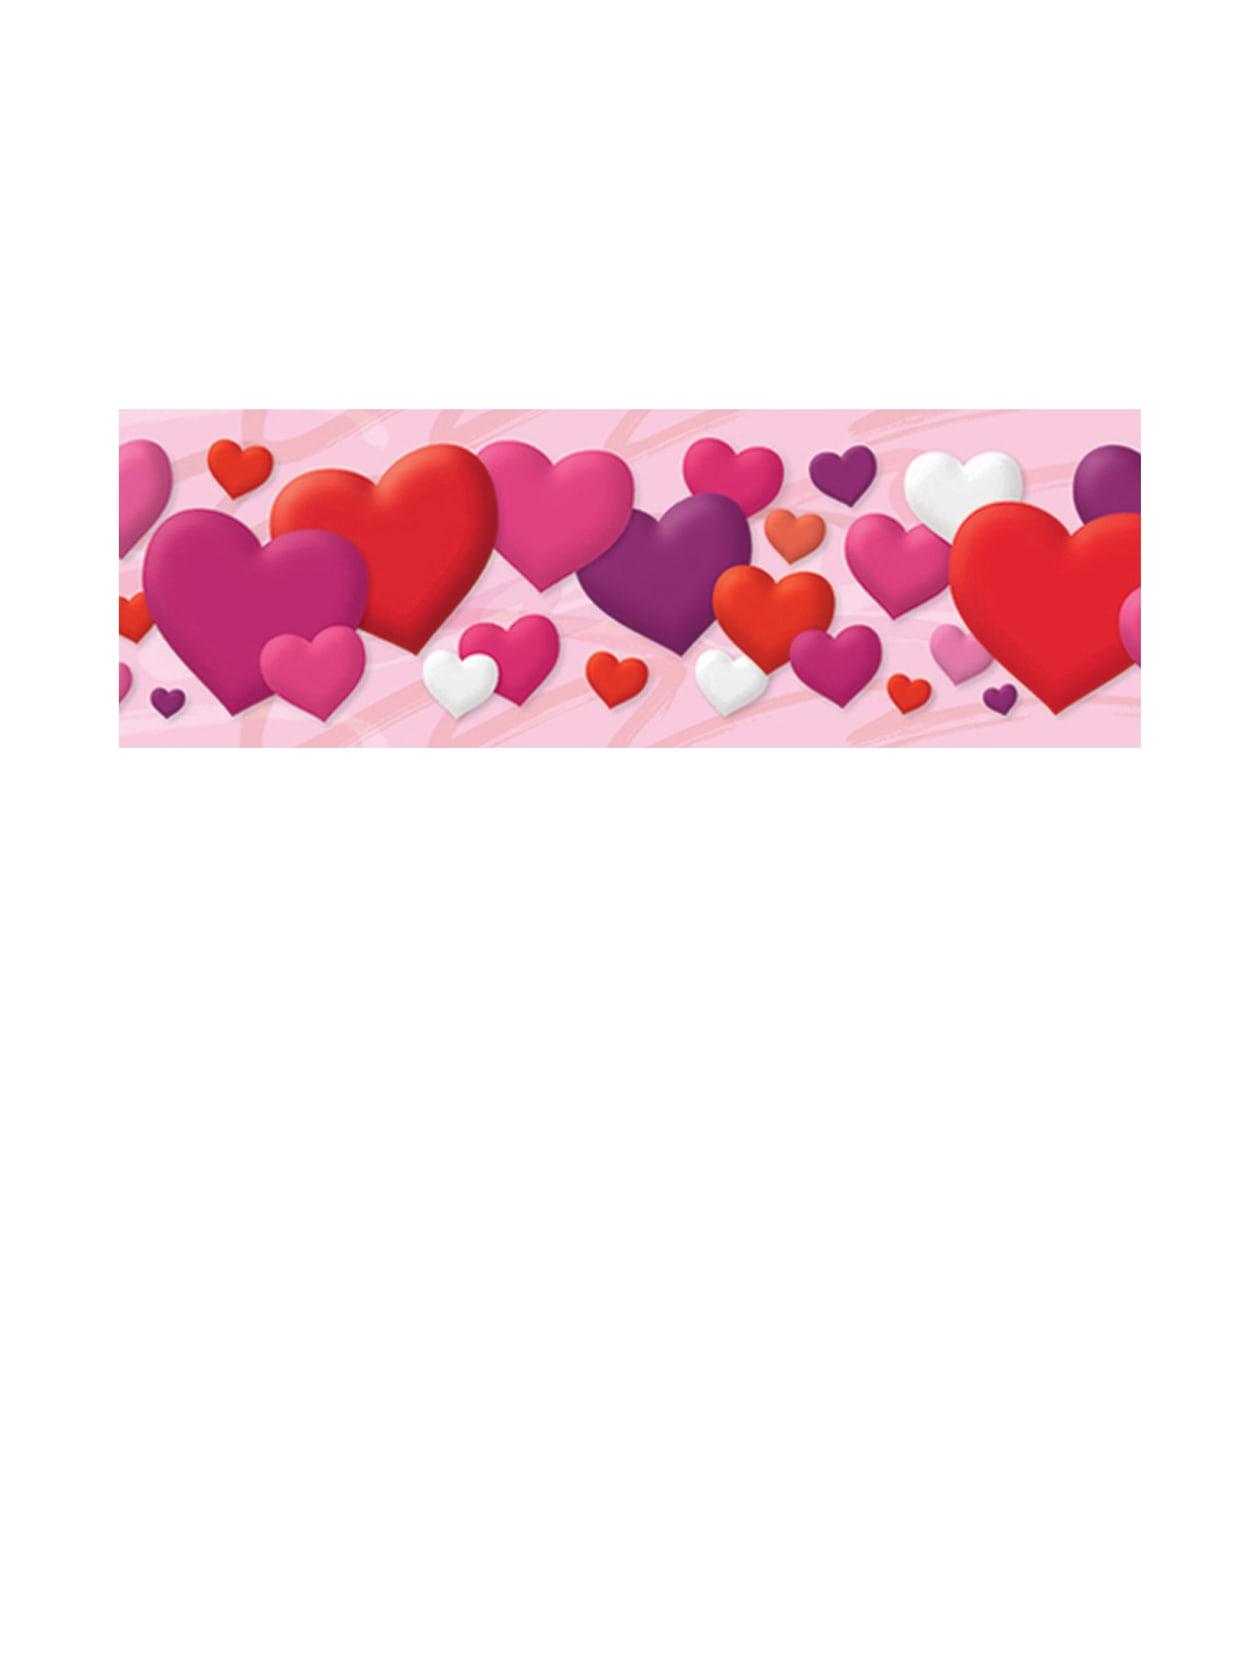 Trend Bolder Borders Bulletin Board Borders 2 34 X 35 34 Hearts Grades Pre K 4 Pack Of 11 Office Depot